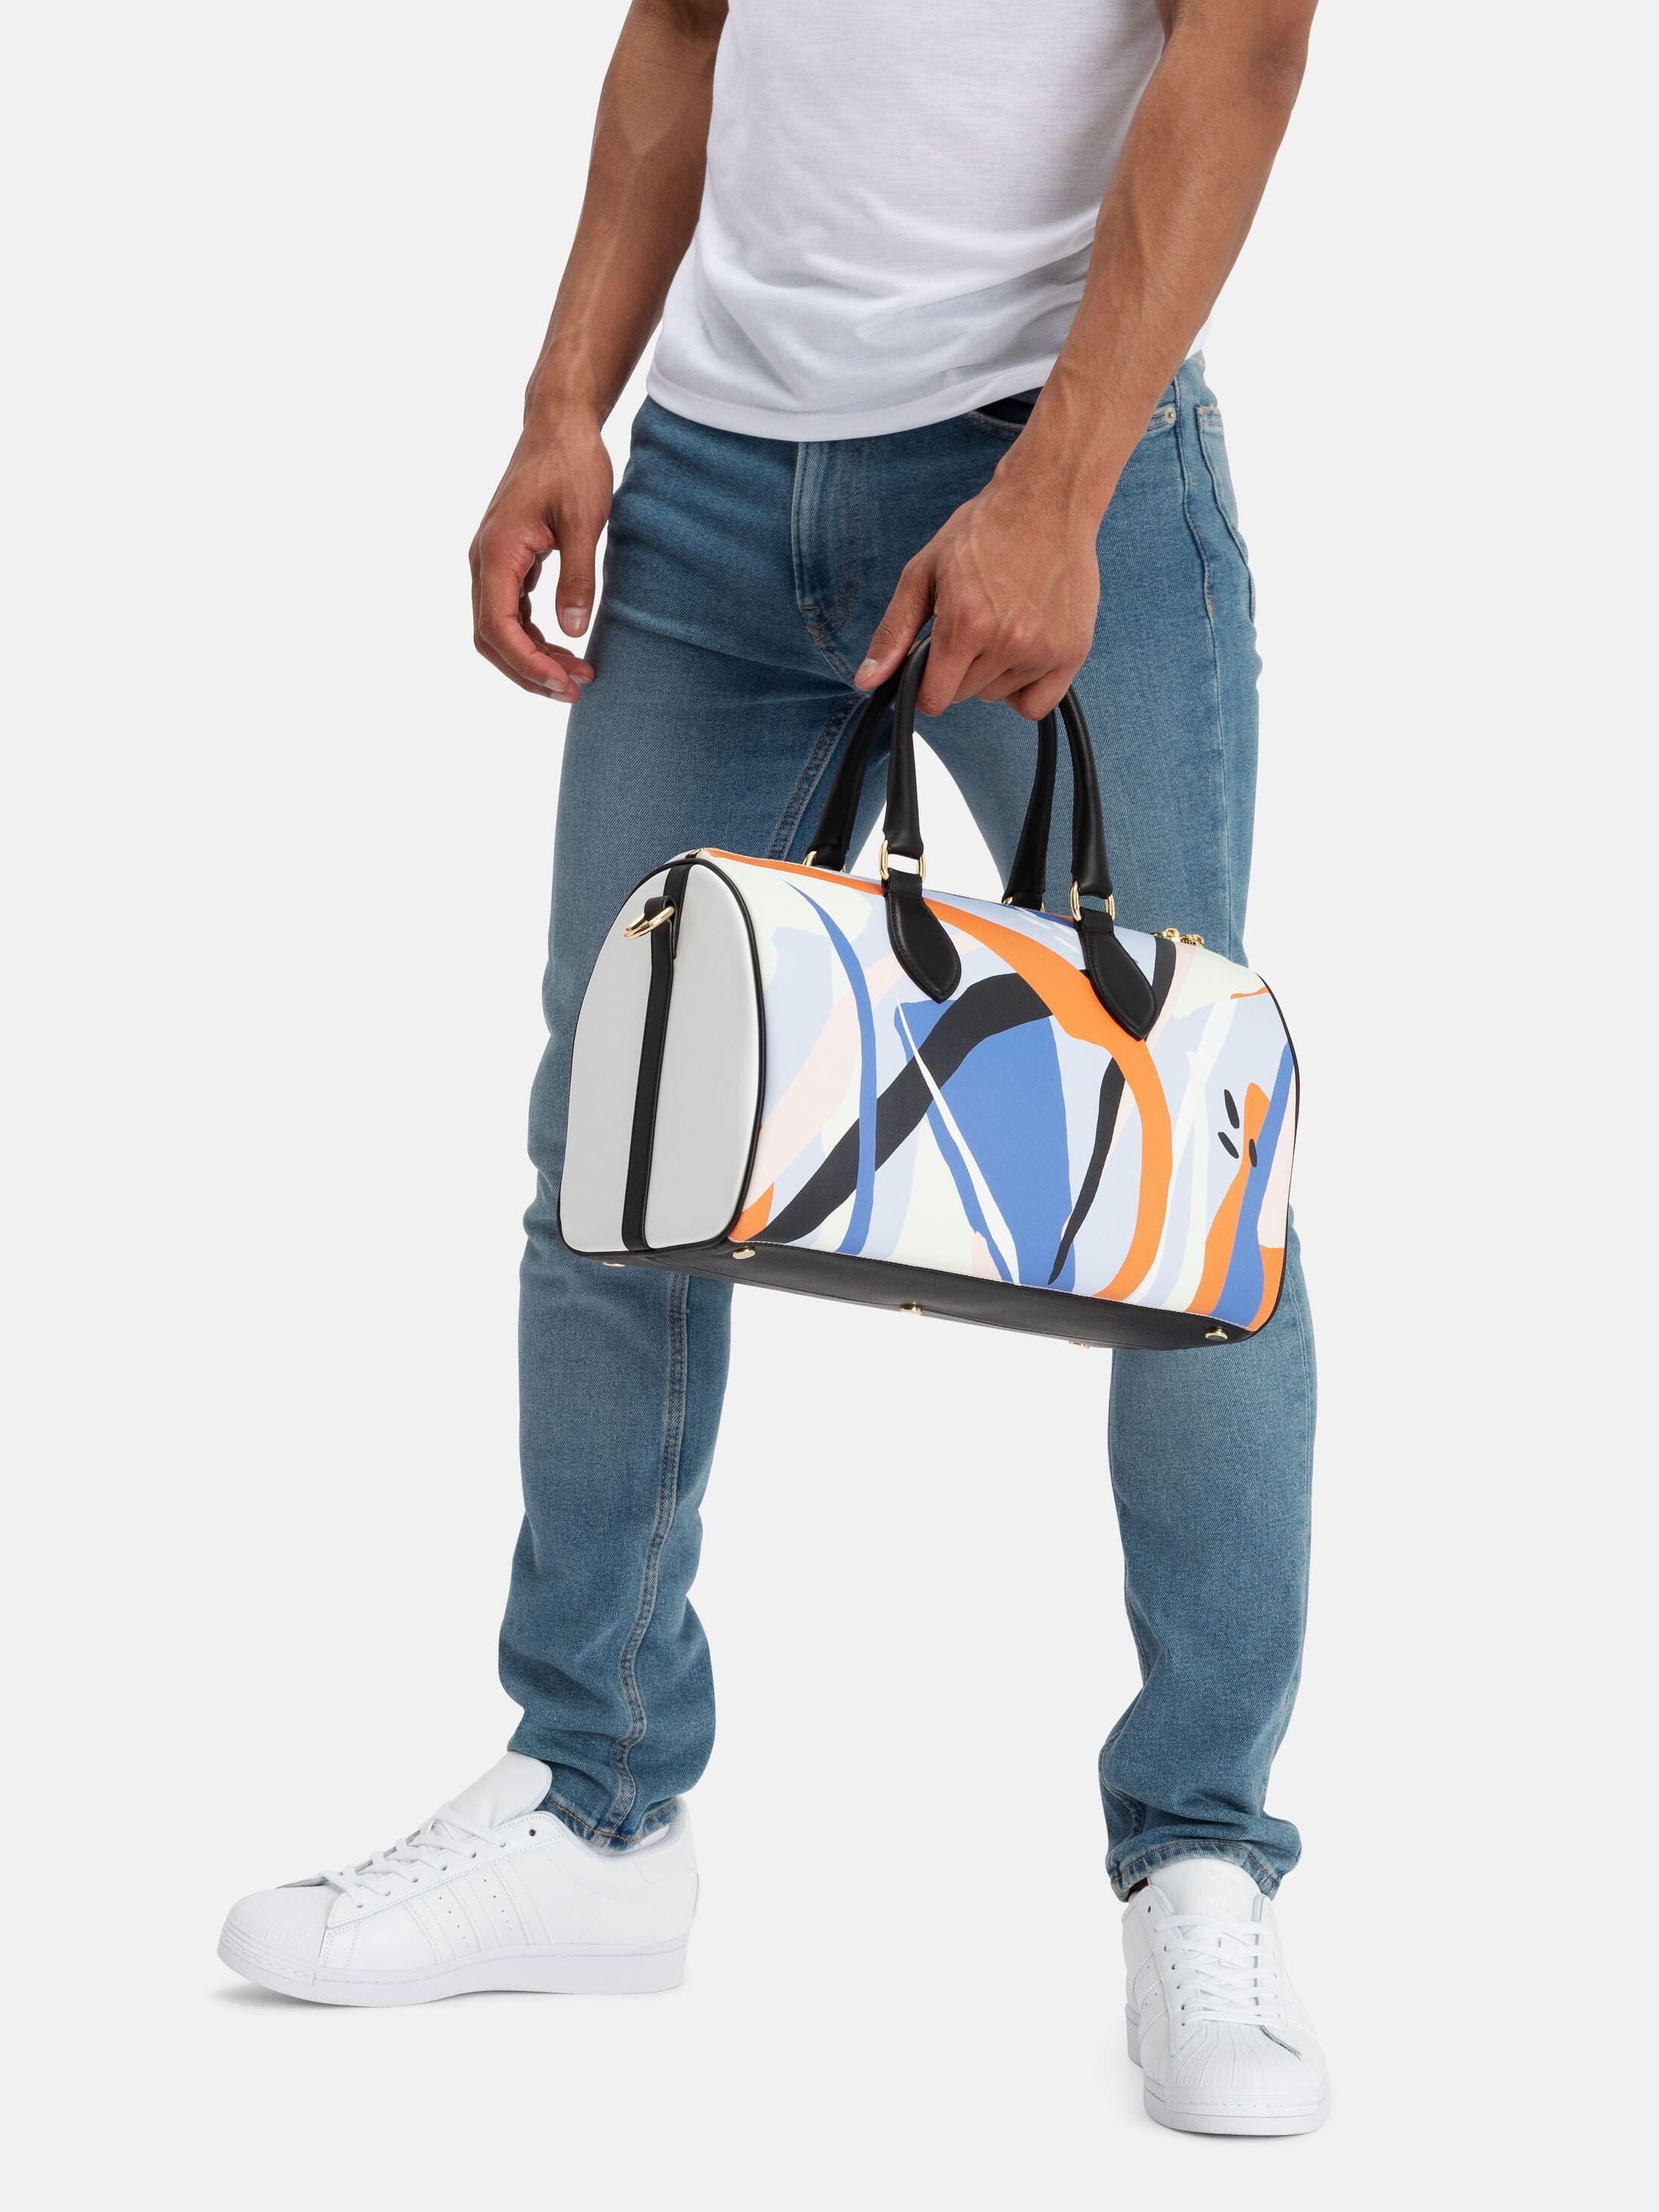 Duffel Bags Bedrukken